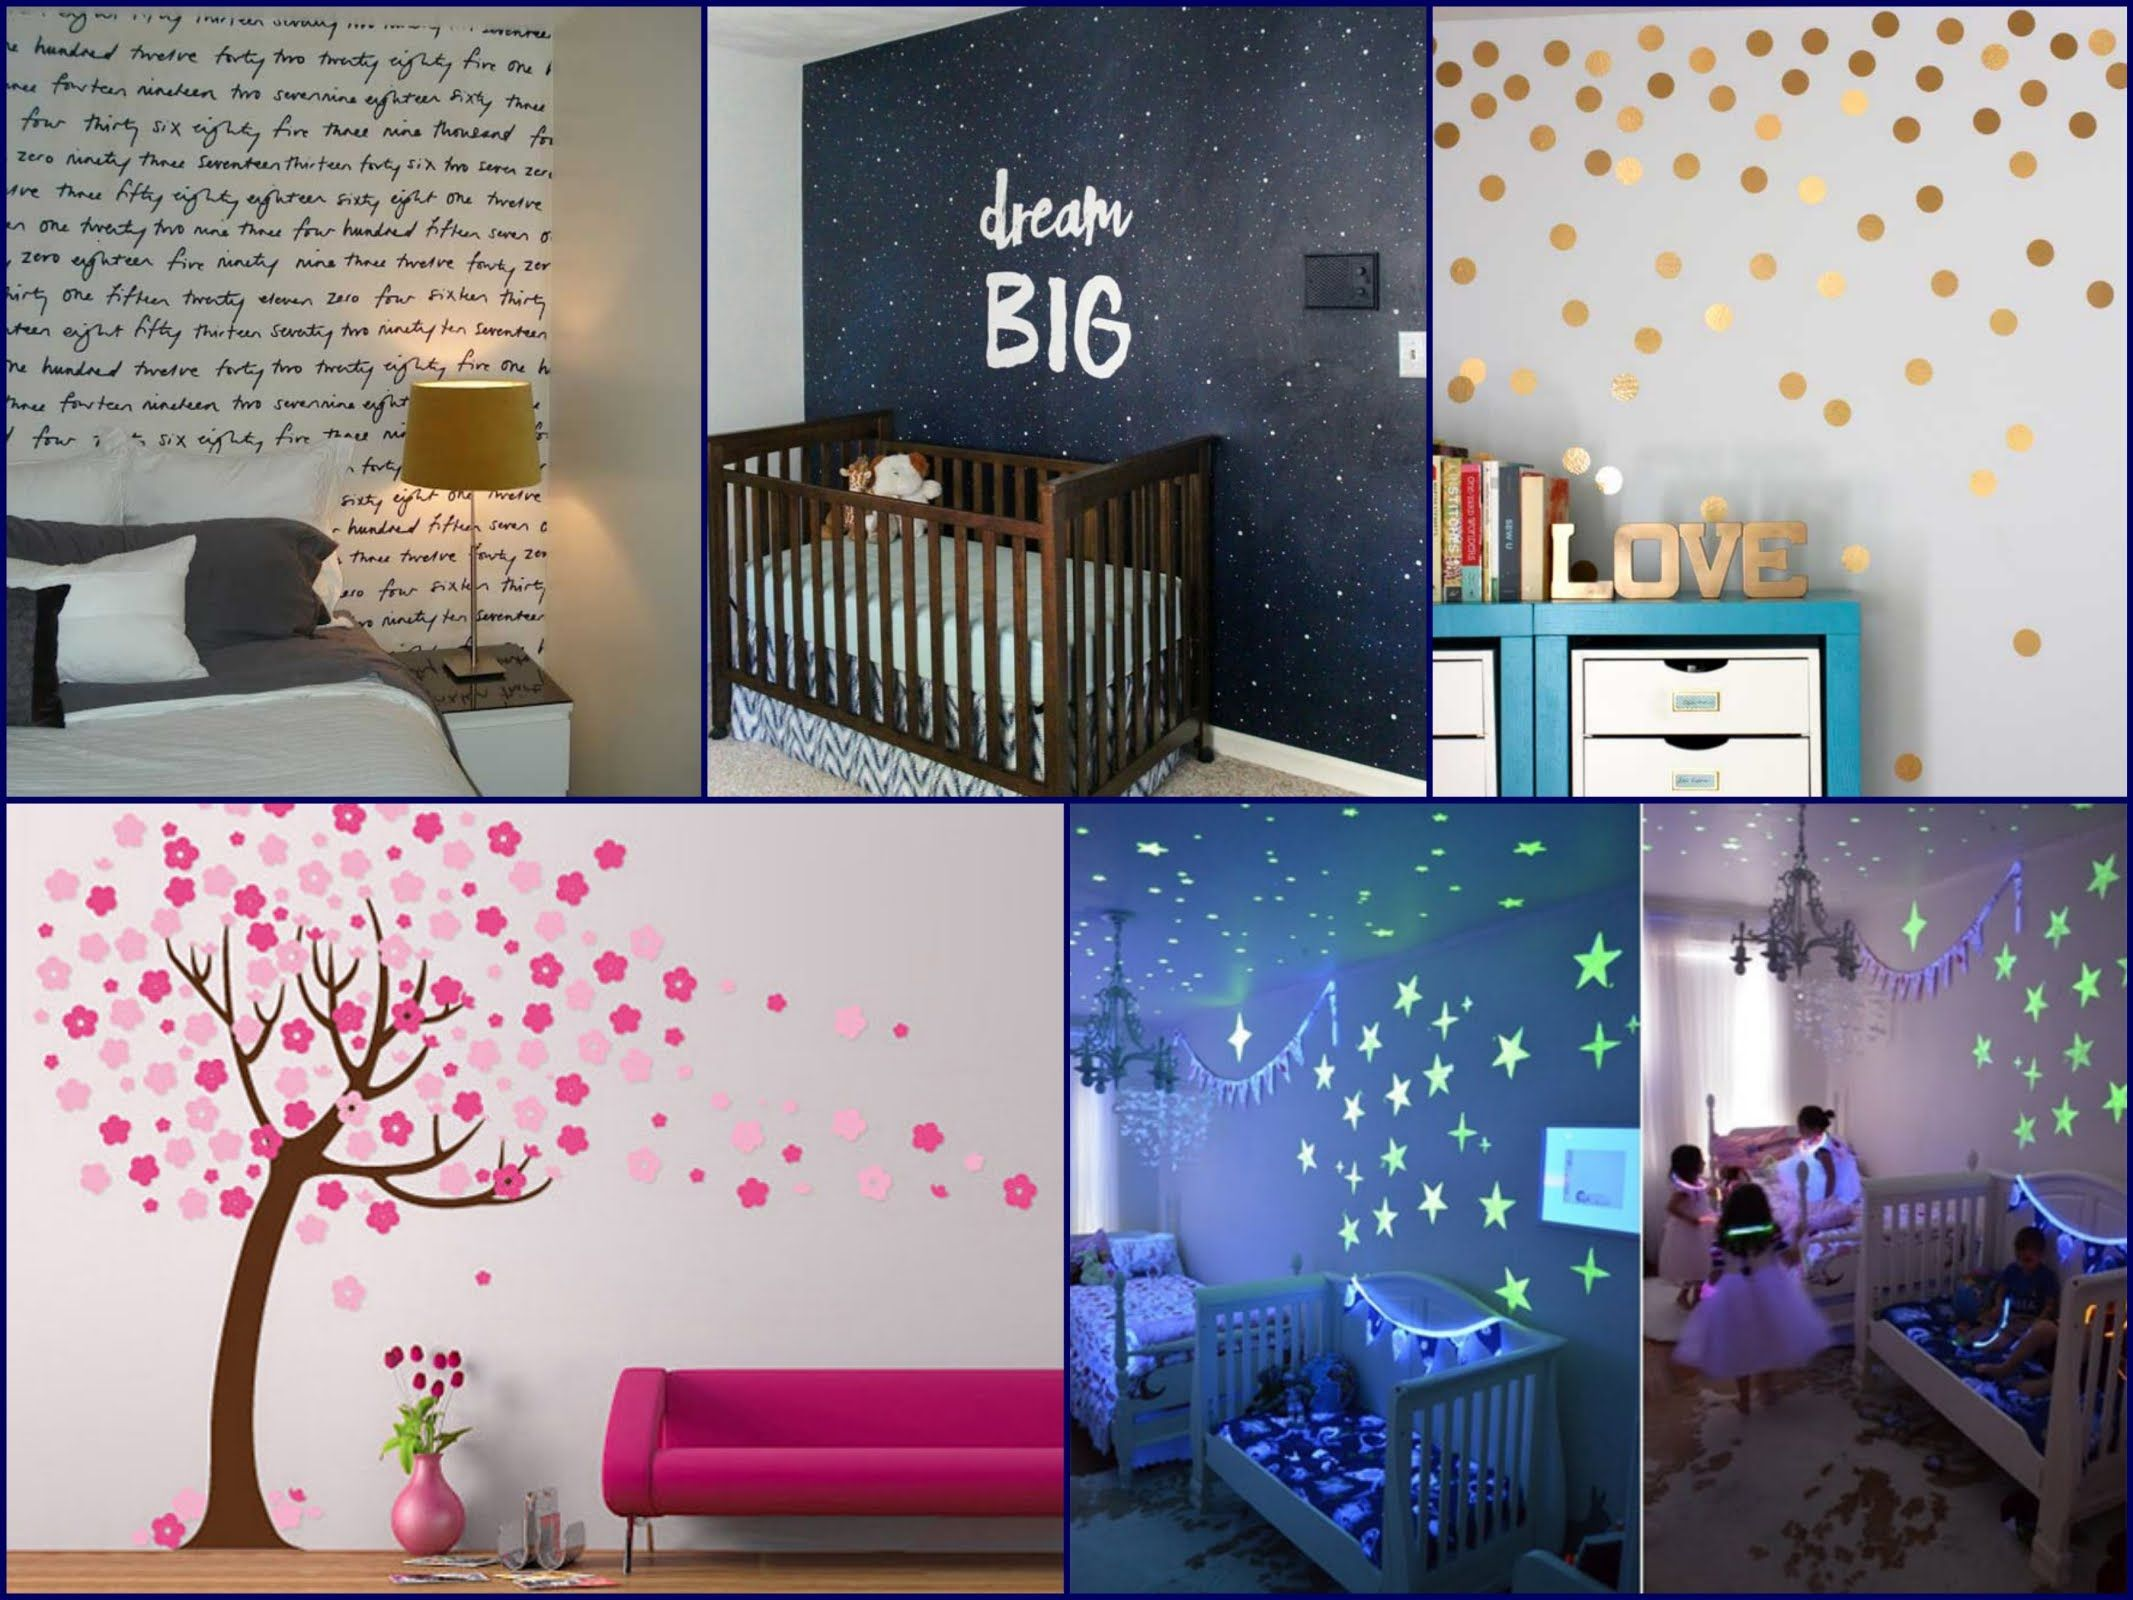 Diy Wall Painting Ideas Easy Home Decor Diy Equipment